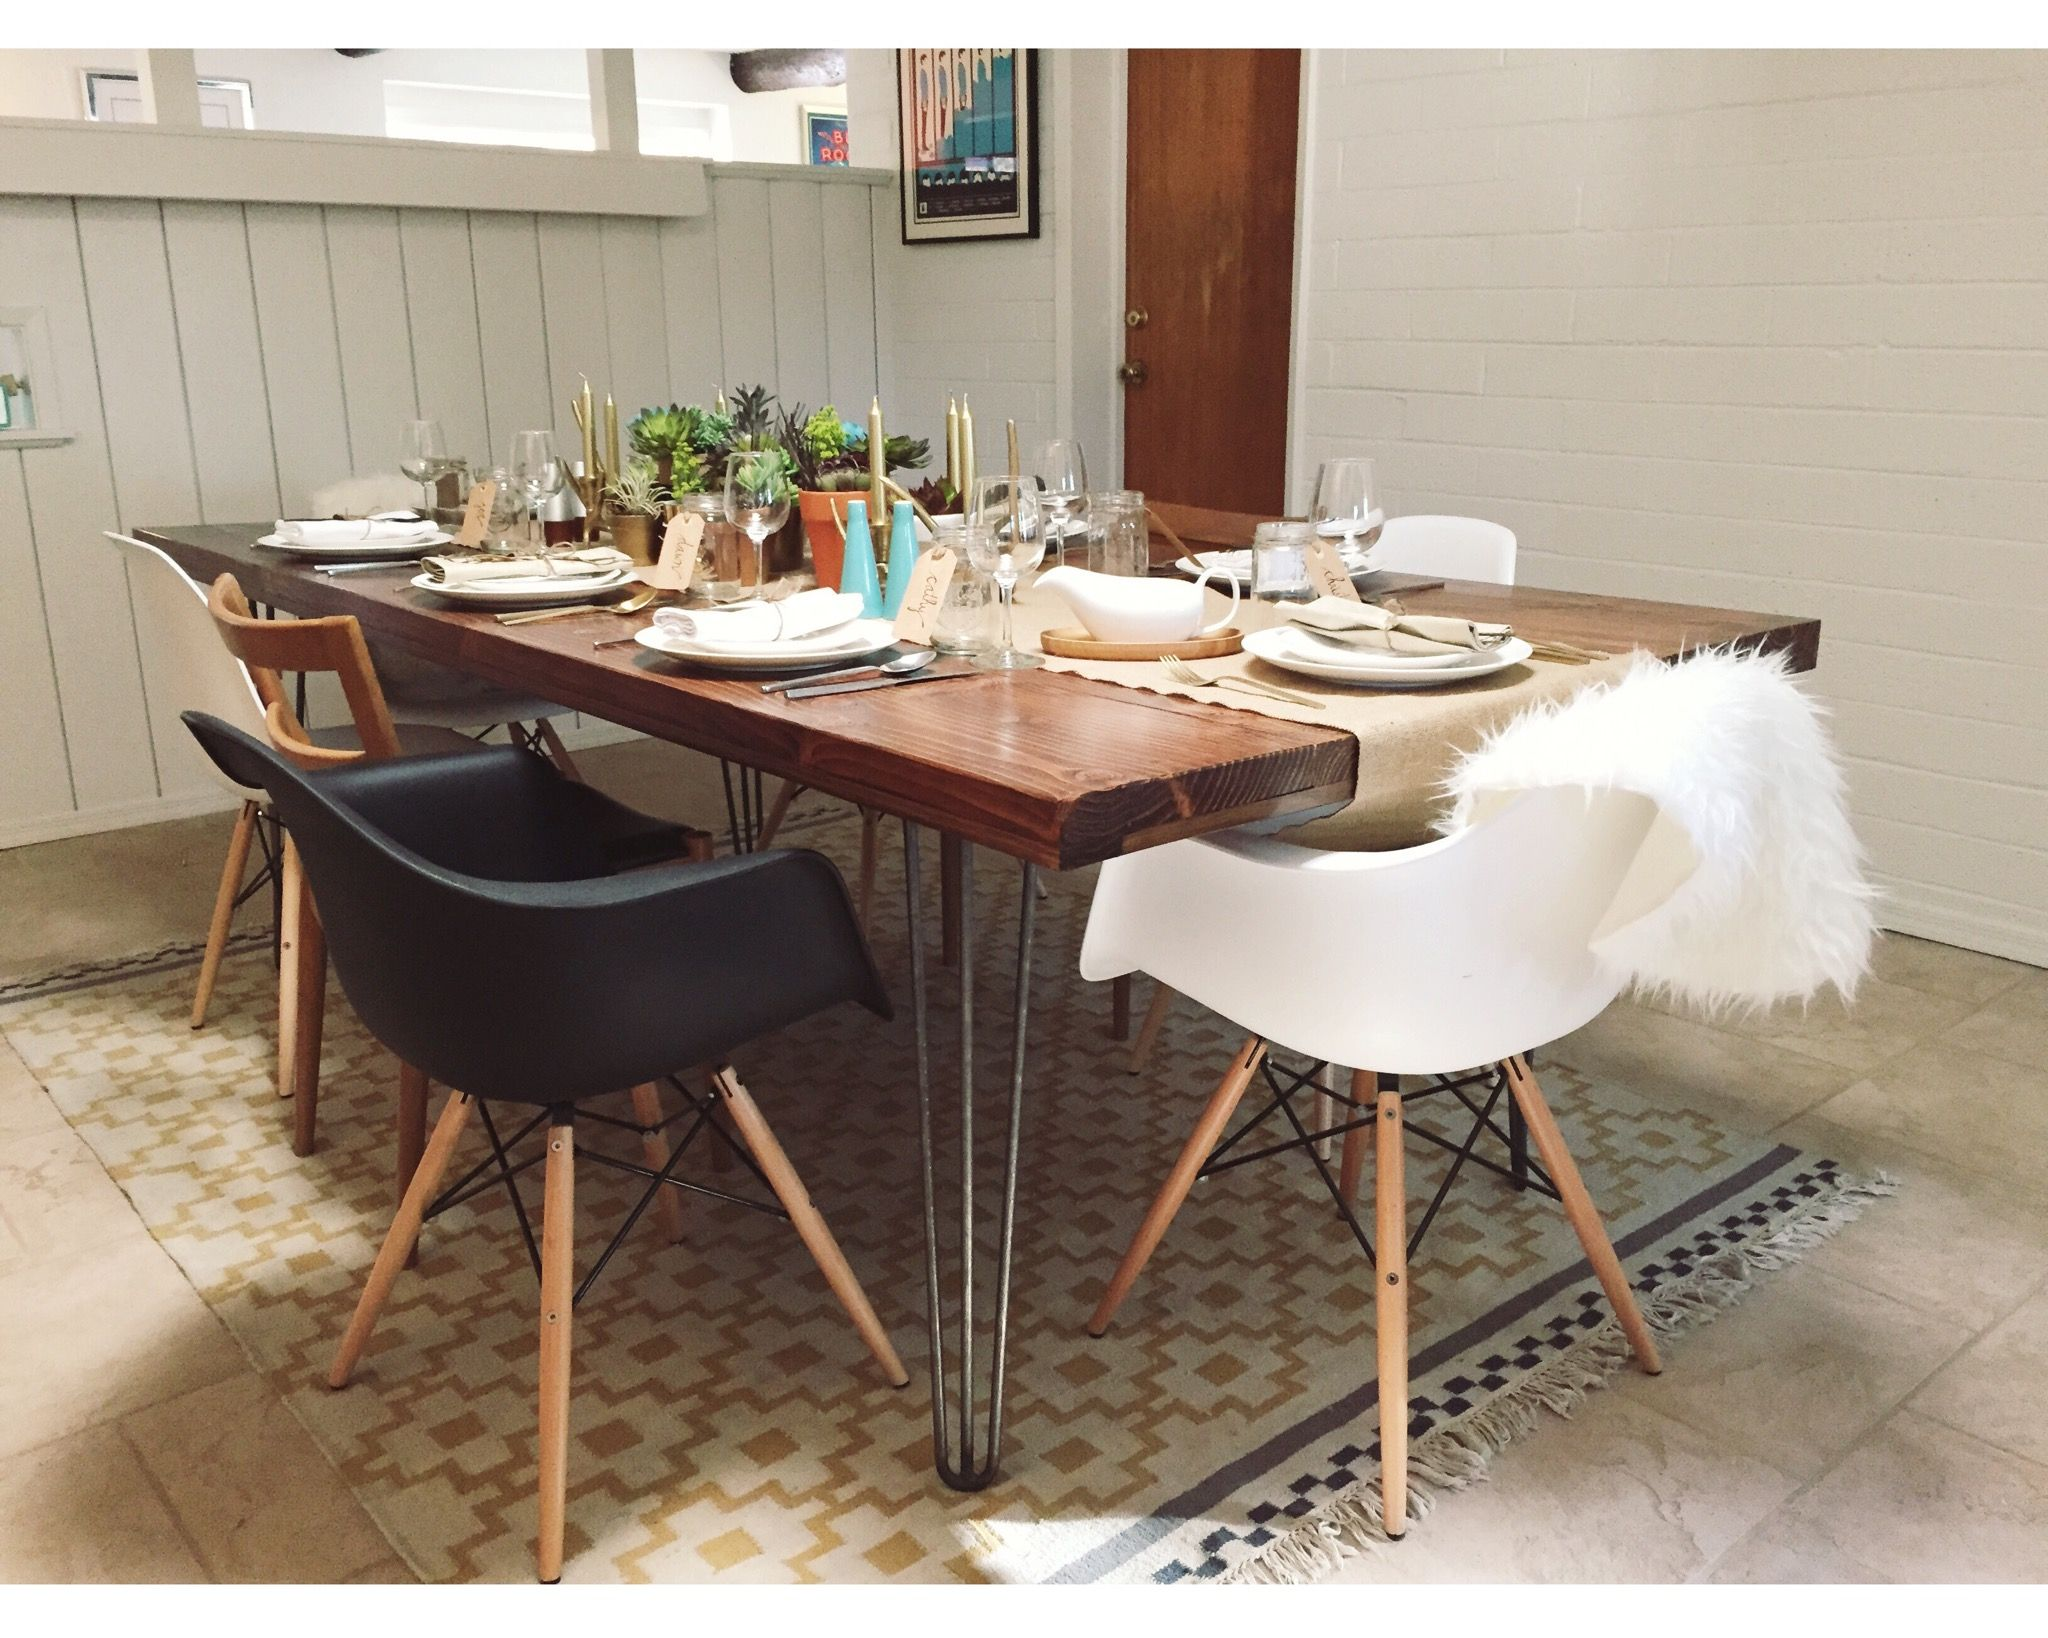 Farmhouse Dining Table DIY Special Walnut Minwax Stain Hairpin Legs